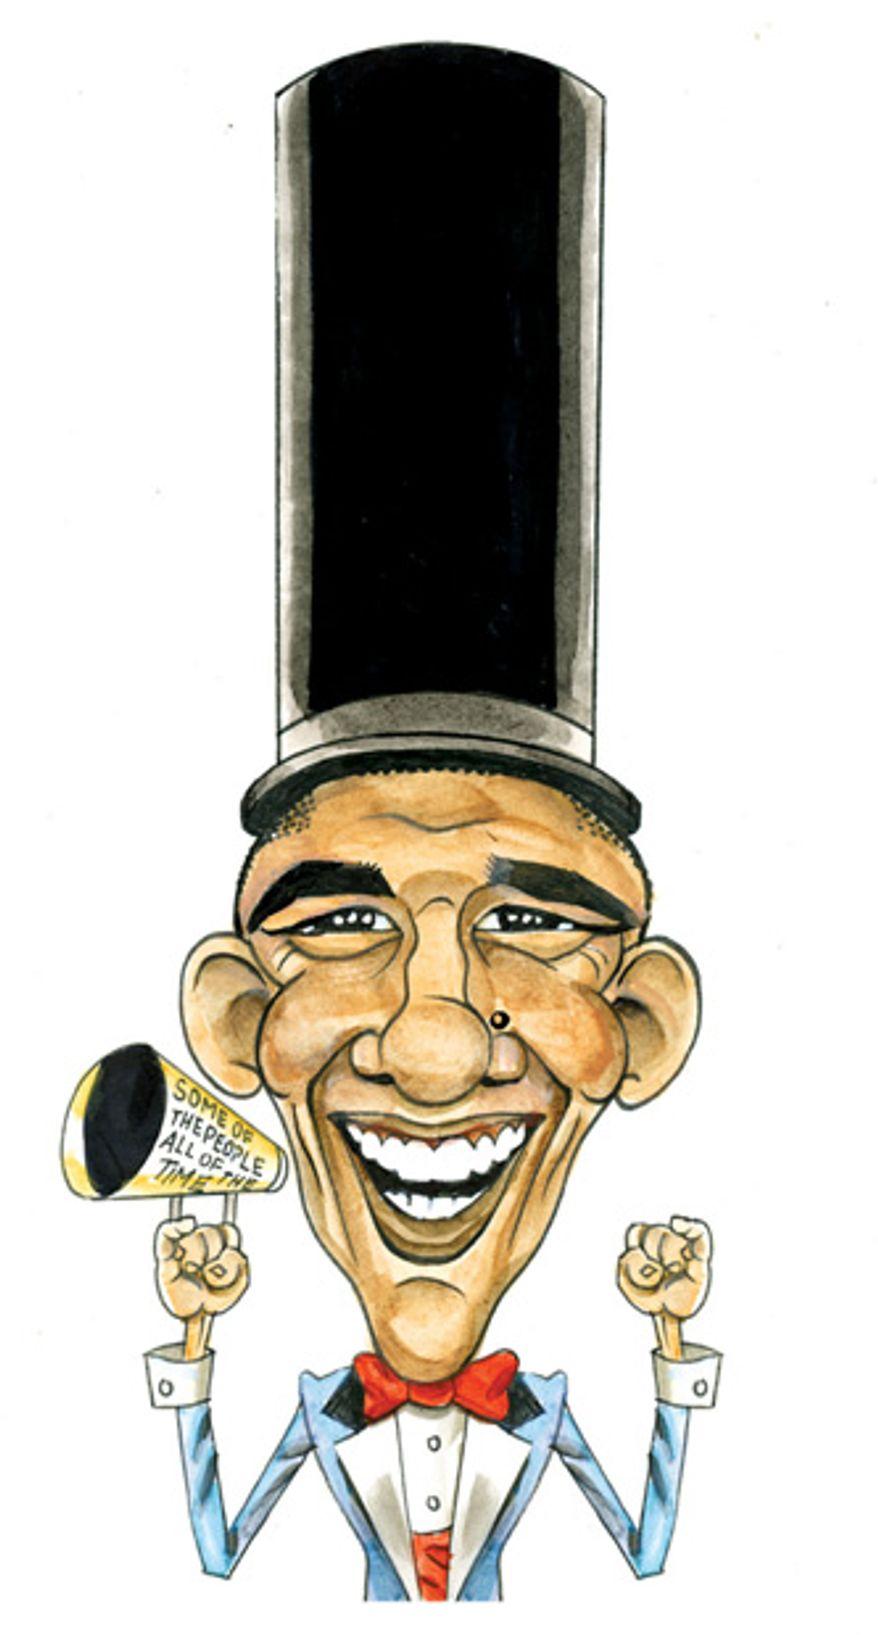 Illustration: Obamaham Lincoln by Alexander Hunter for The Washington Times